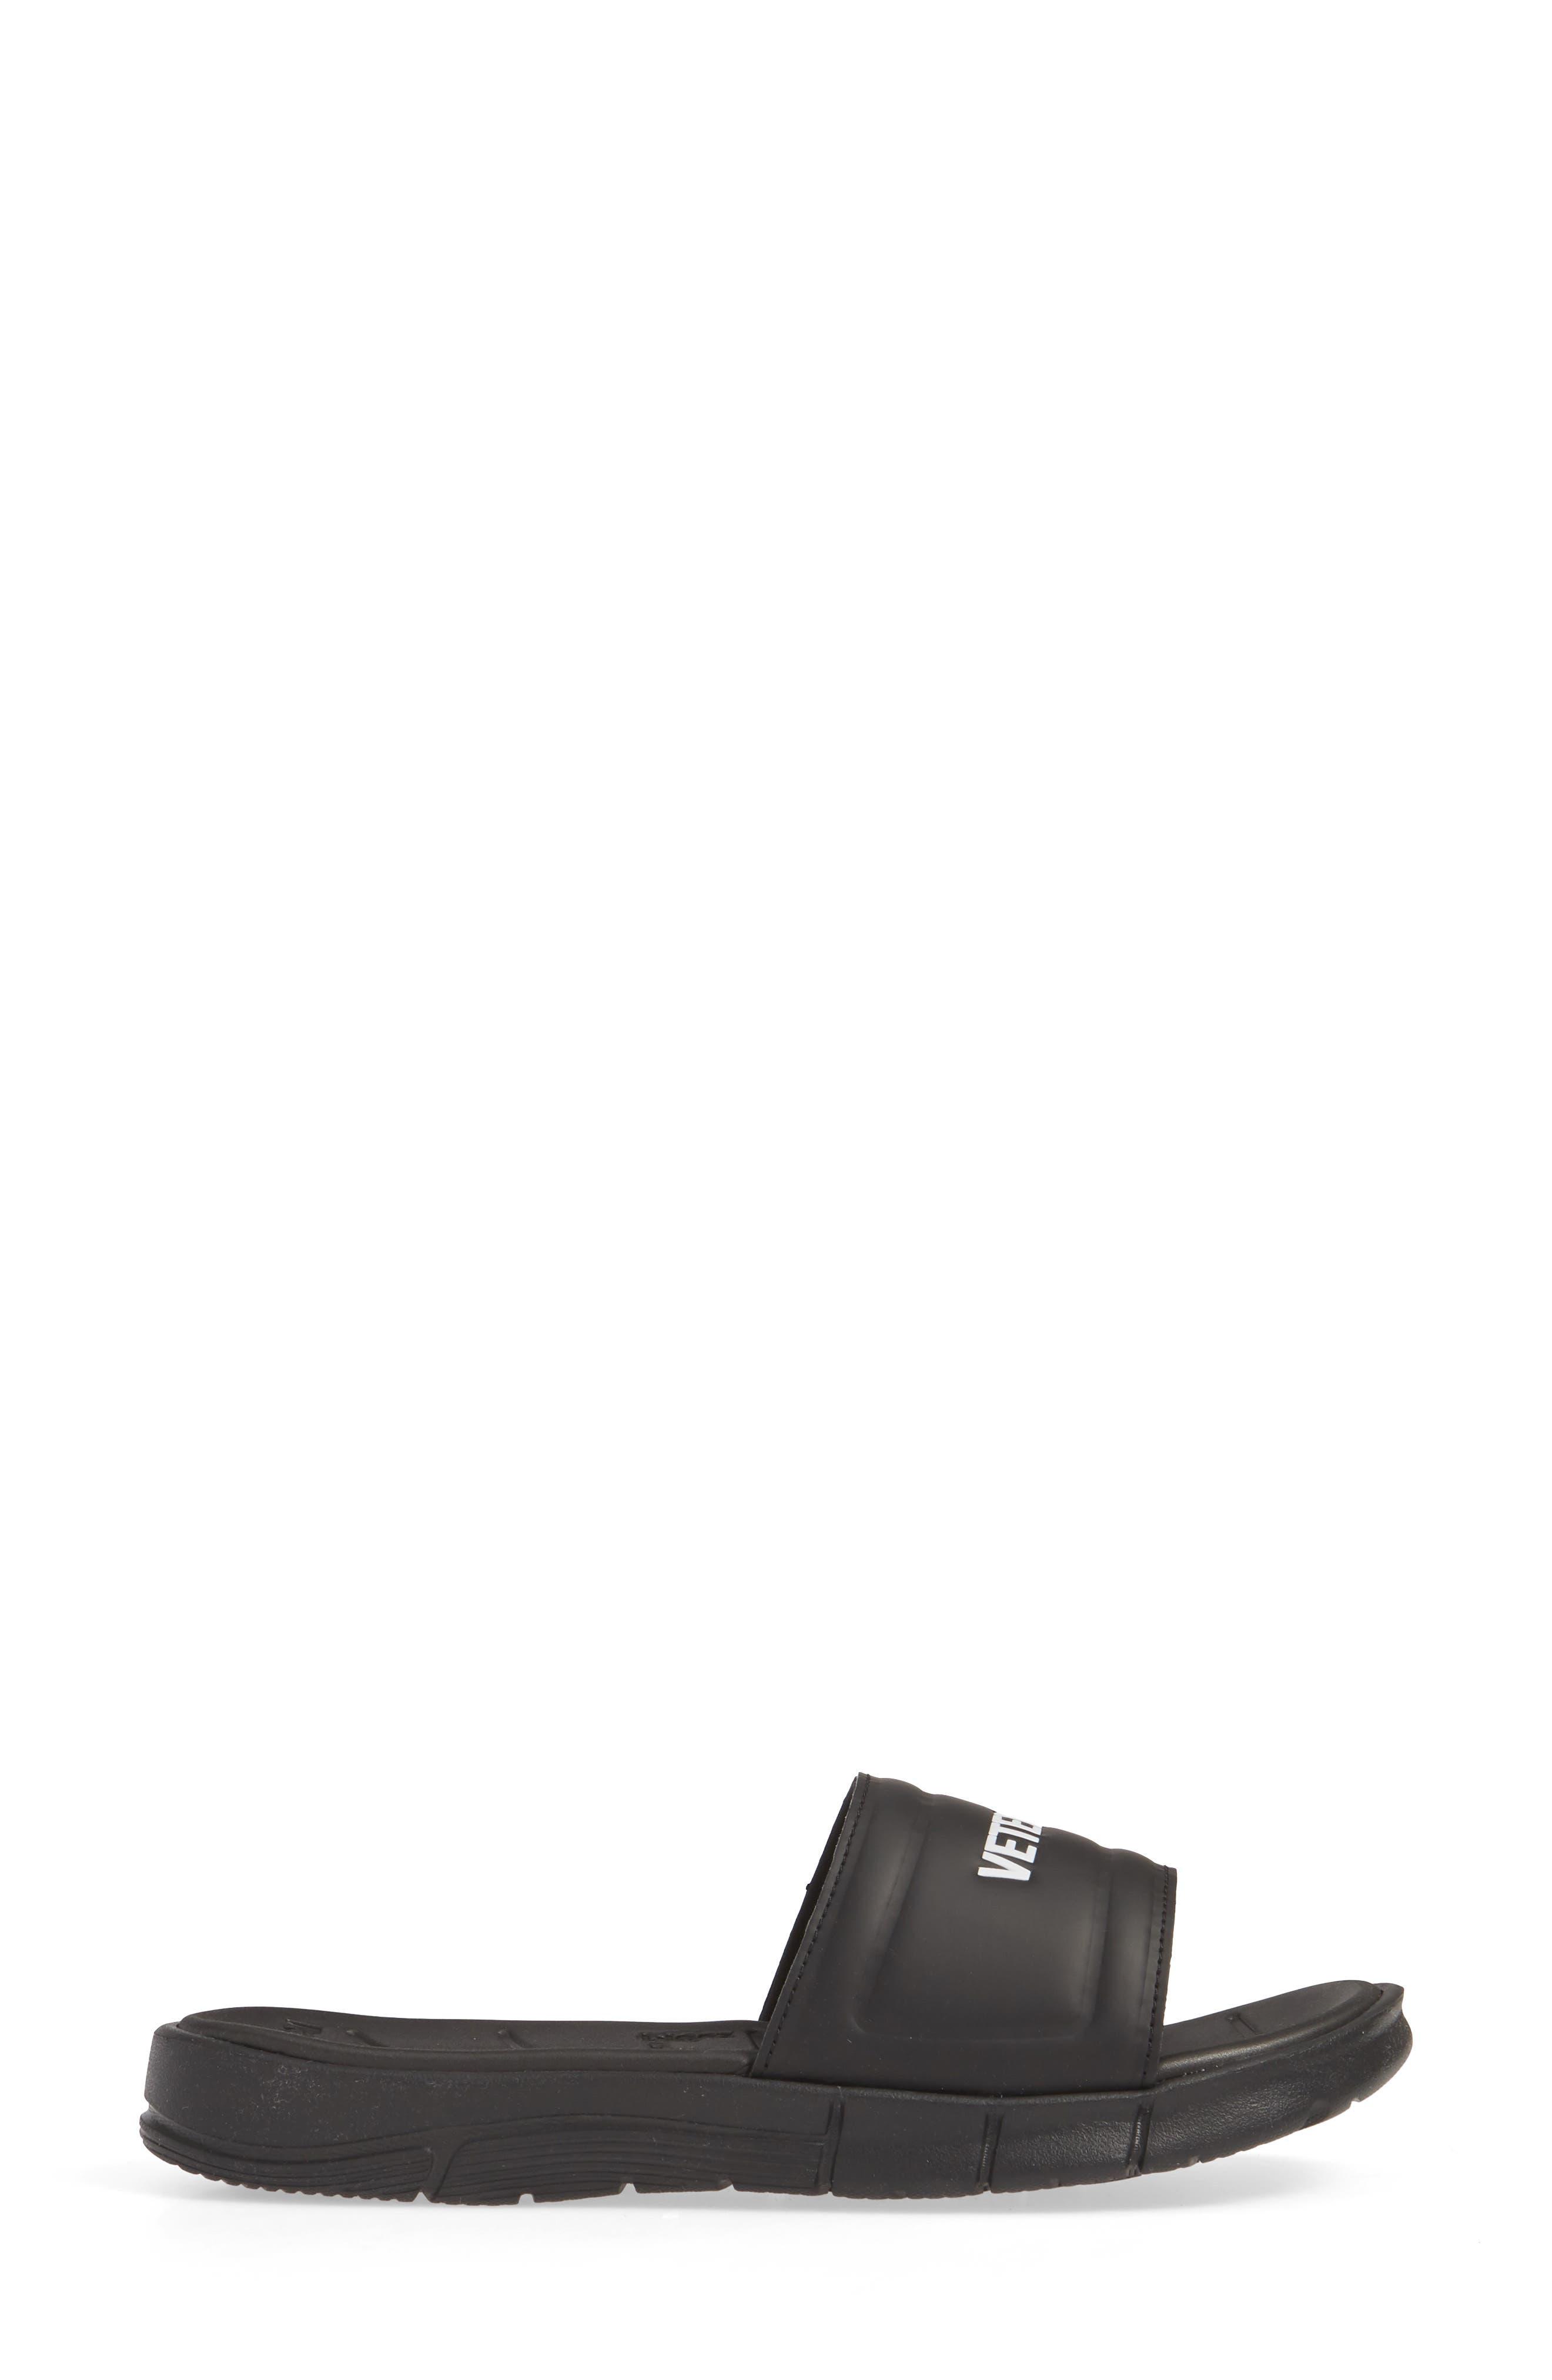 VETEMENTS, x Reebok Logo Slide Sandal, Alternate thumbnail 3, color, BLACK/ WHITE